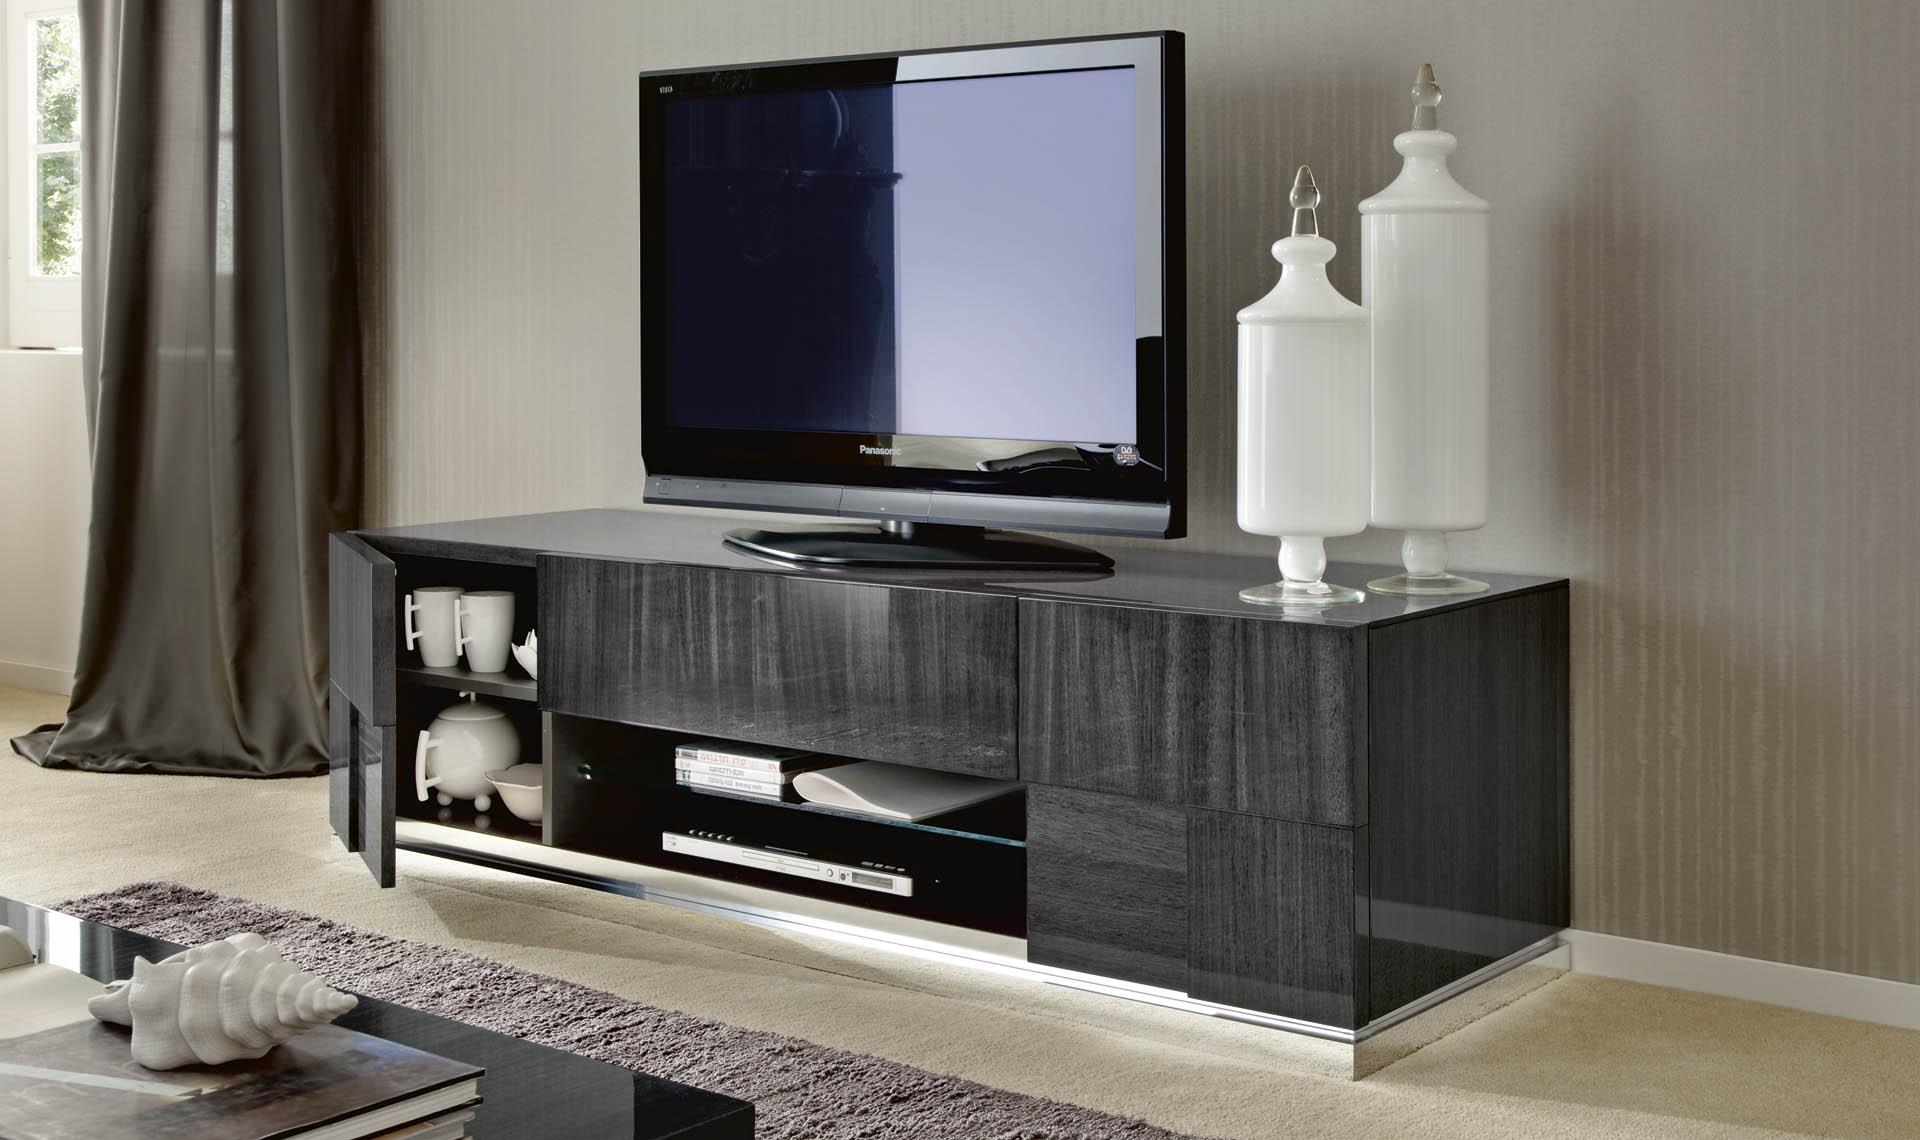 Montecarlo TV Base and Curio Details